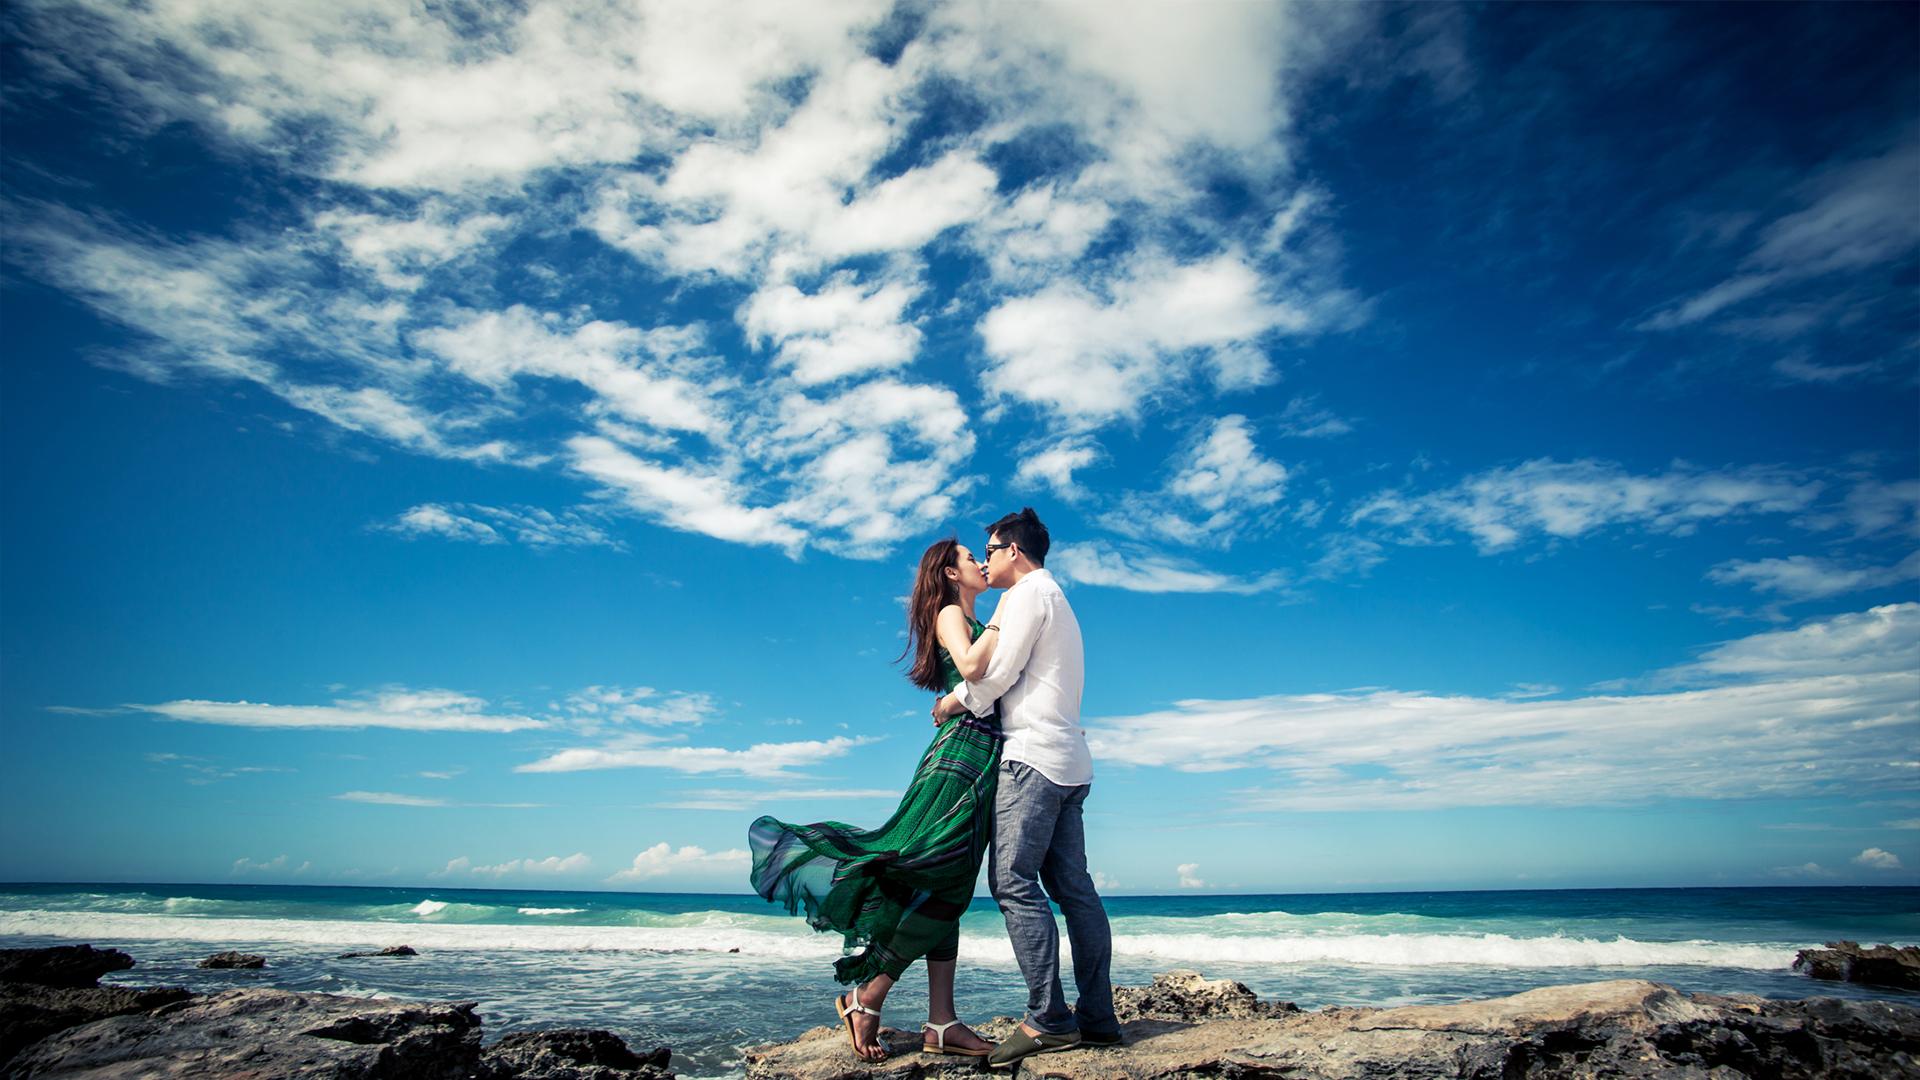 Sprazzi_Professional_Photography_Photographer_Cancun_Mexico_LewisTommy_Original_3.jpg